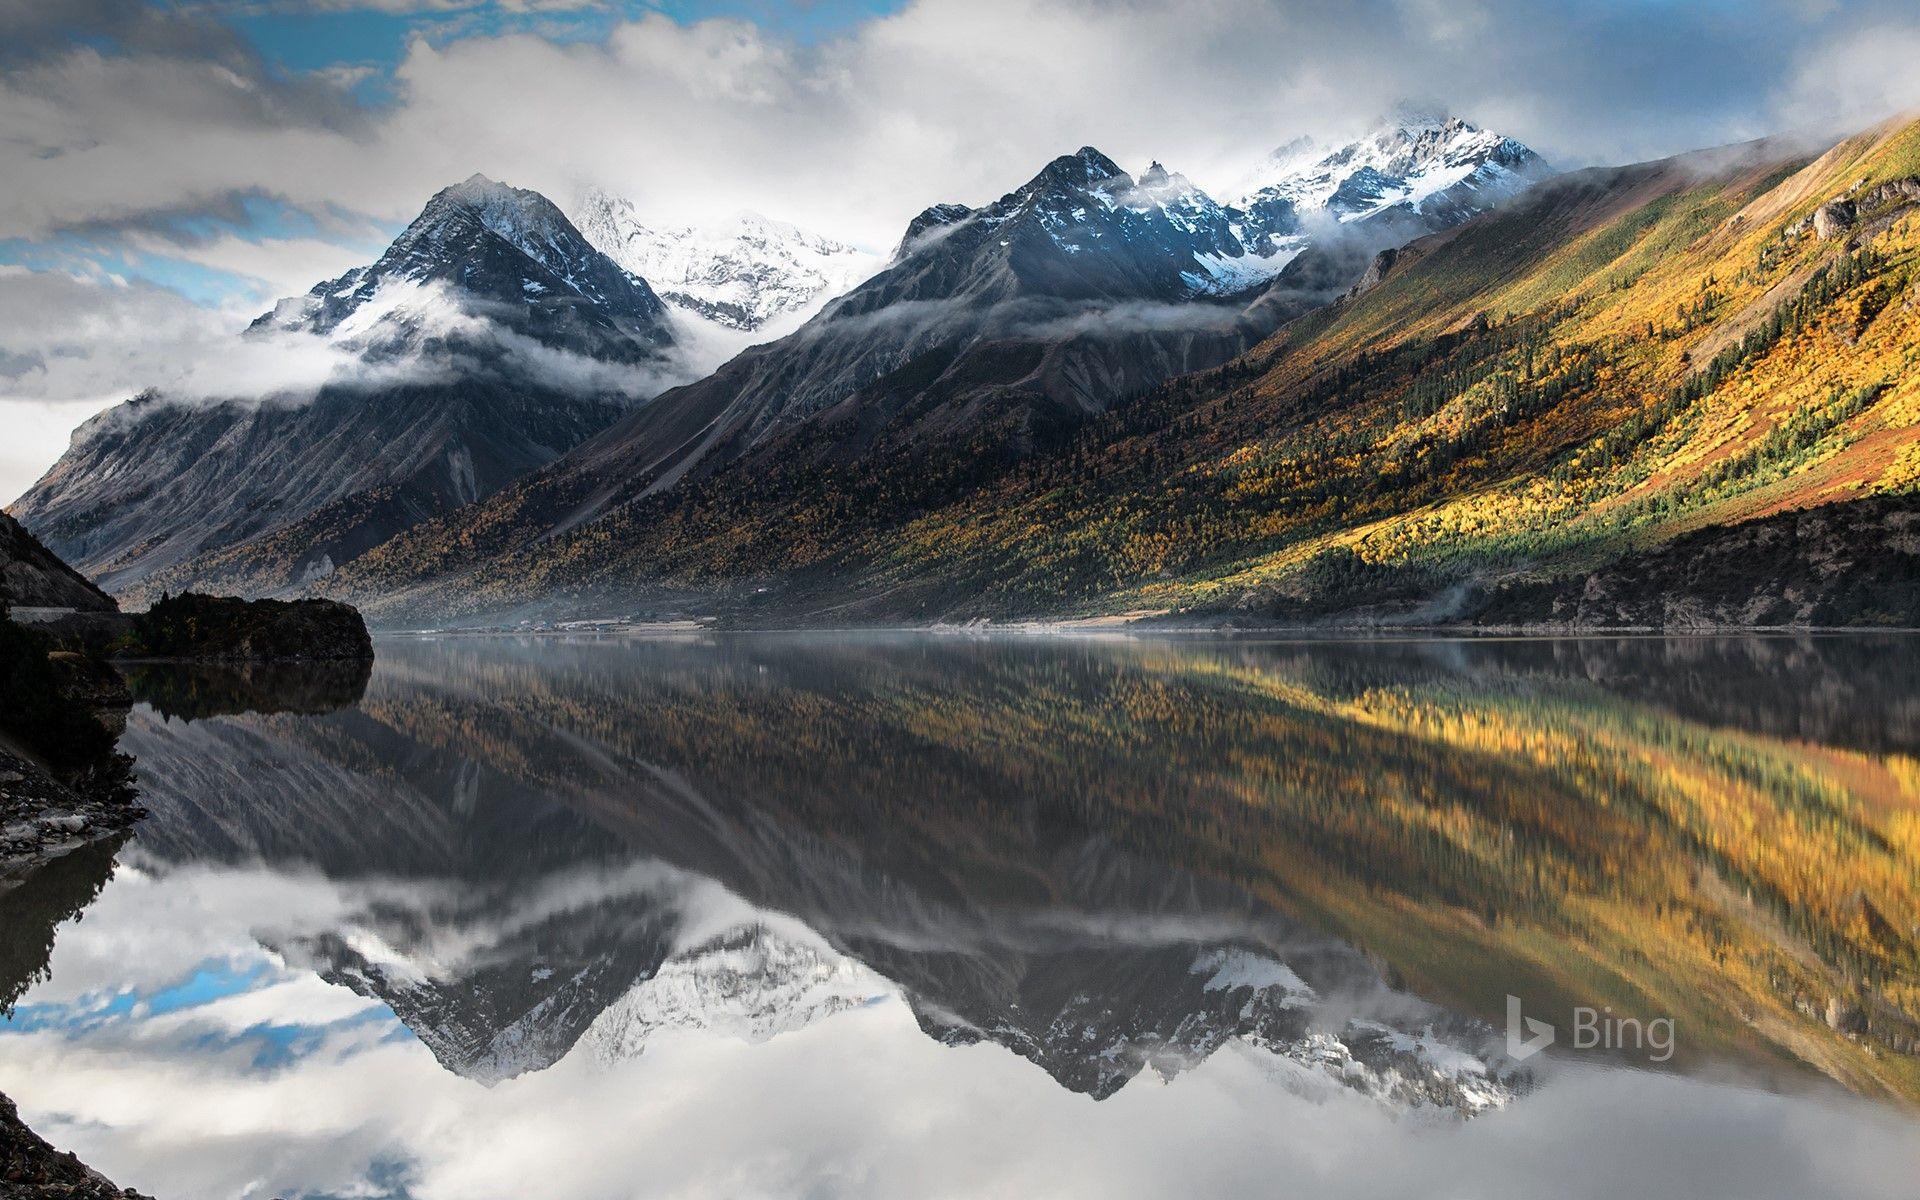 Bing Daily Picture For July 01 Ranwu Lake Near Rawu Tibet Autonomous Region China Scenic Lakes Tibet Lake